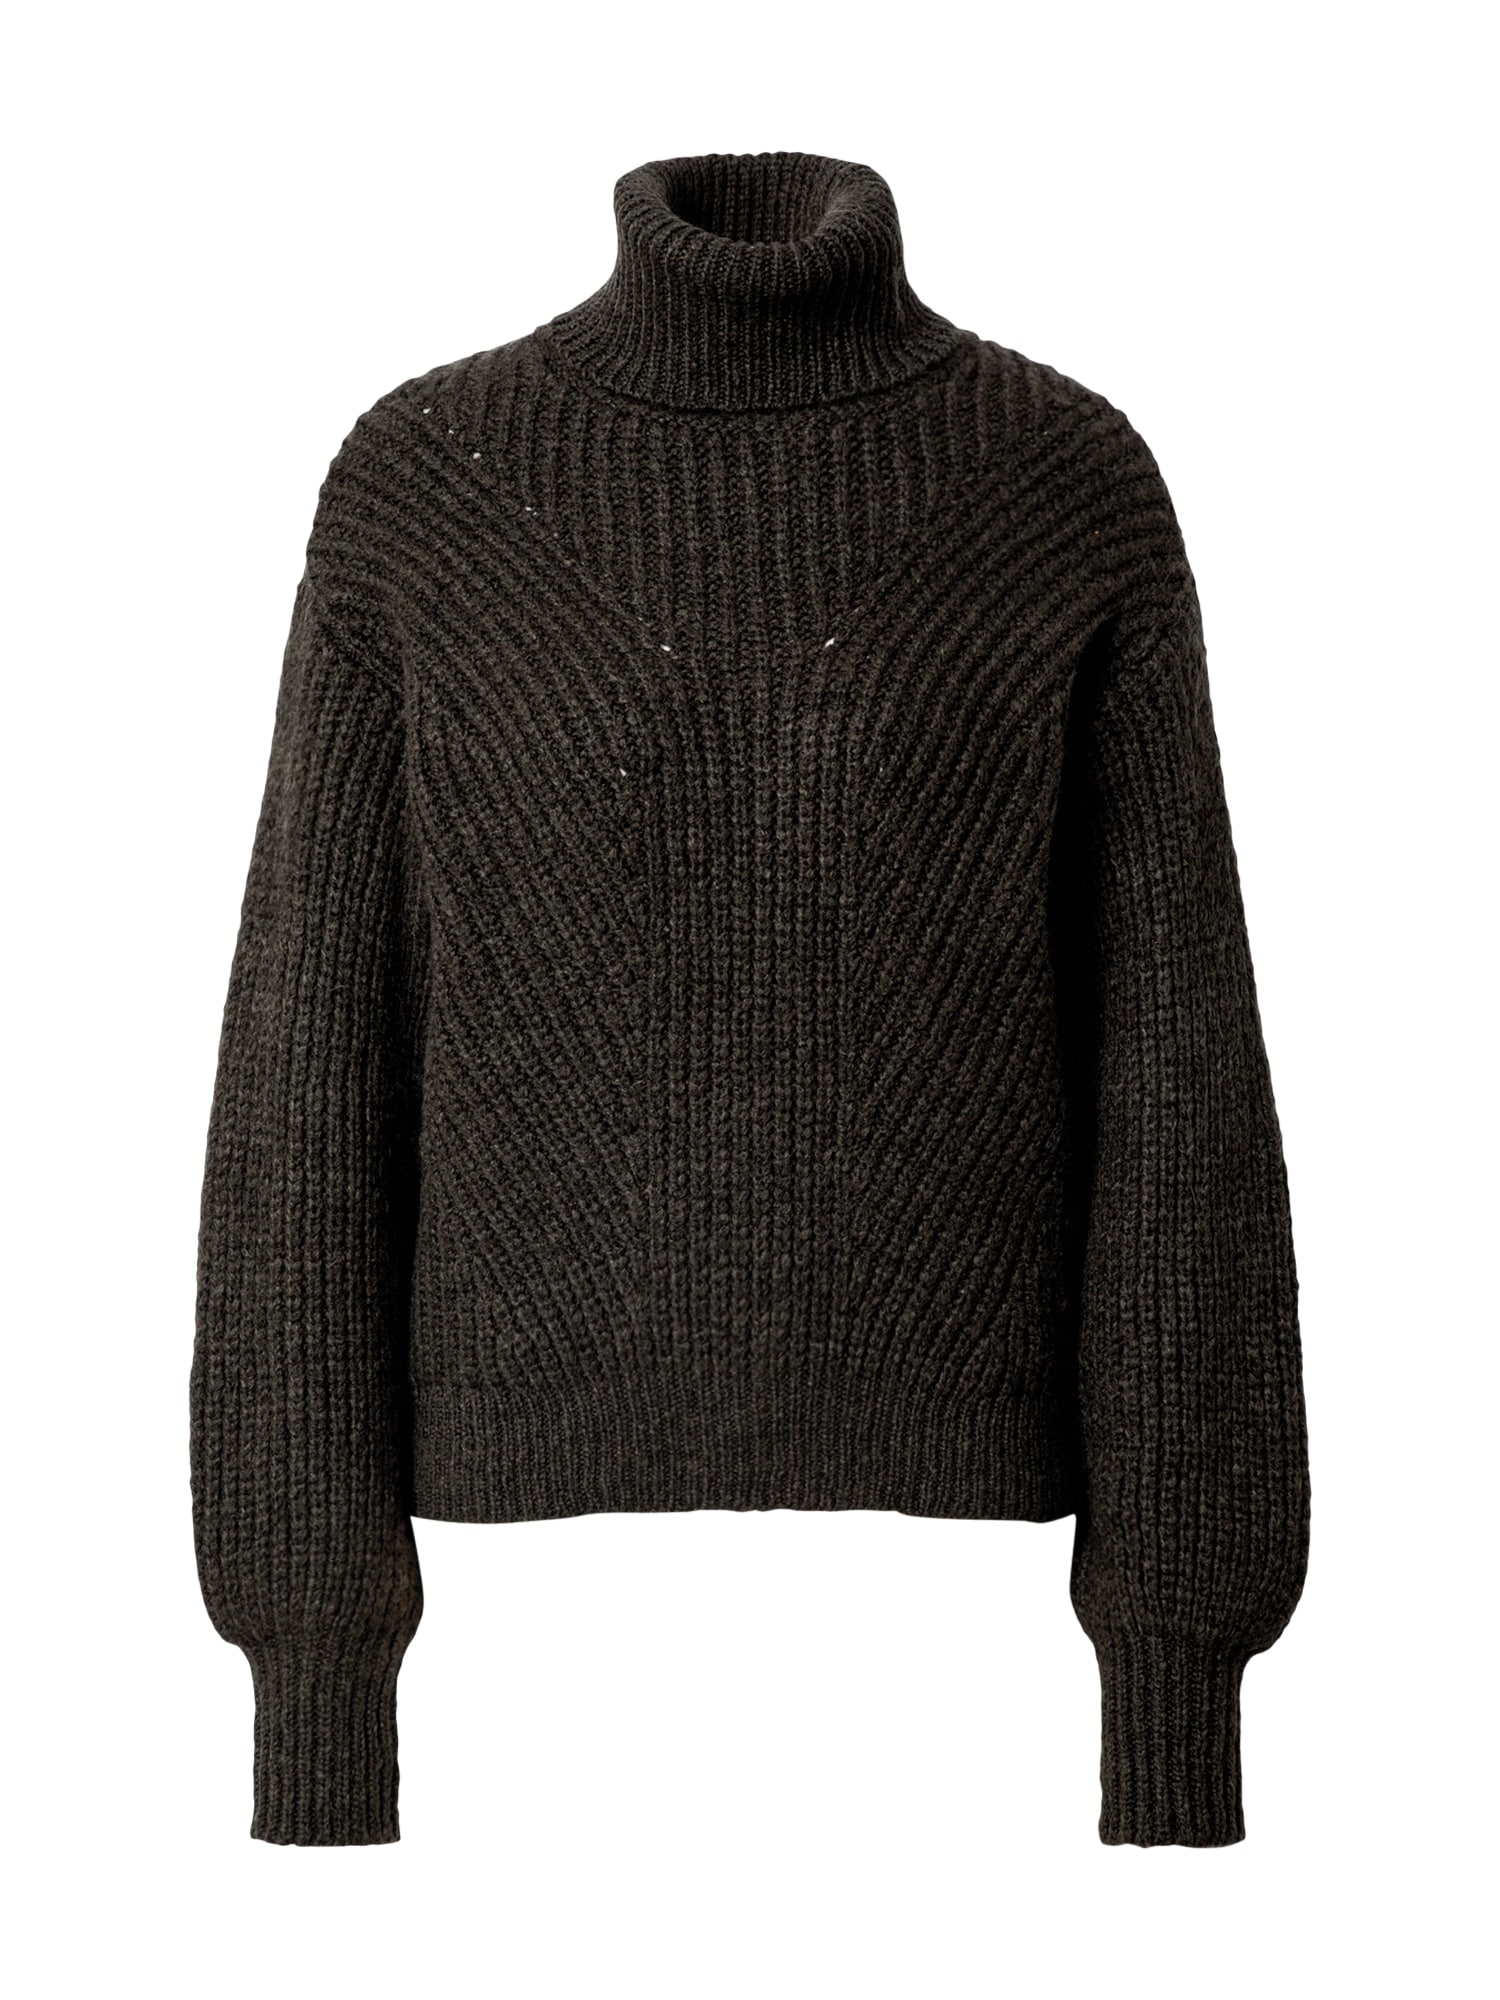 Y.A.S Megztinis tamsiai žalia